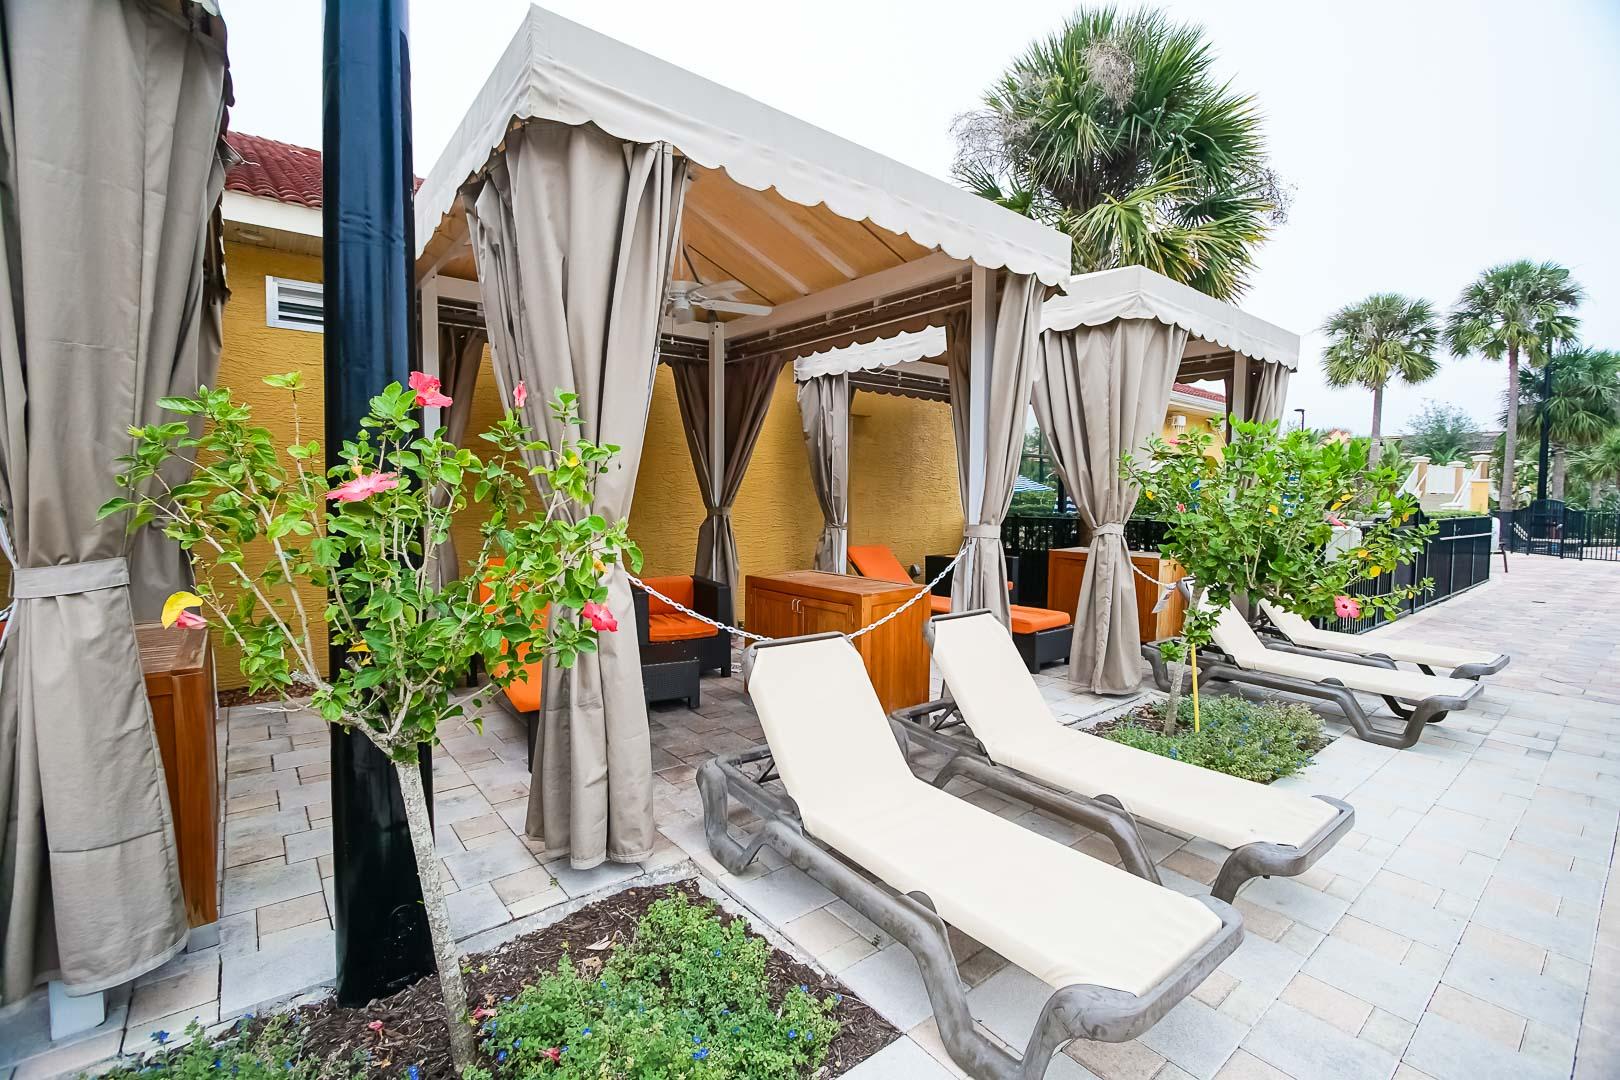 A modern pool lounging area at VRI's Fantasy World Resort in Florida.